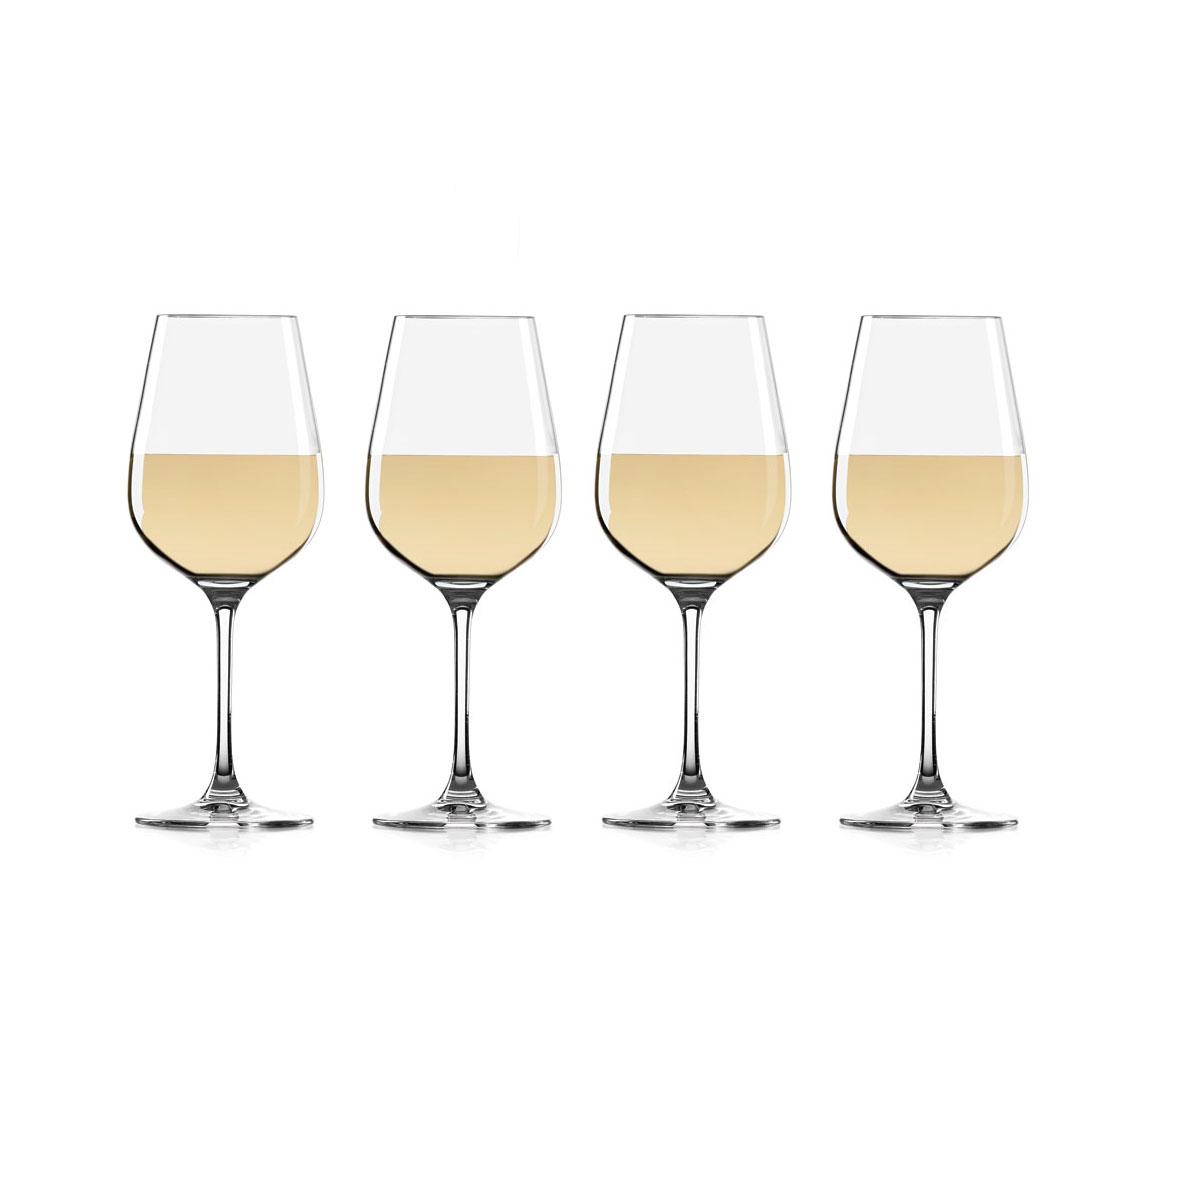 Lenox Tuscany Classics, Crystal Pinot Grigio, Set of 4